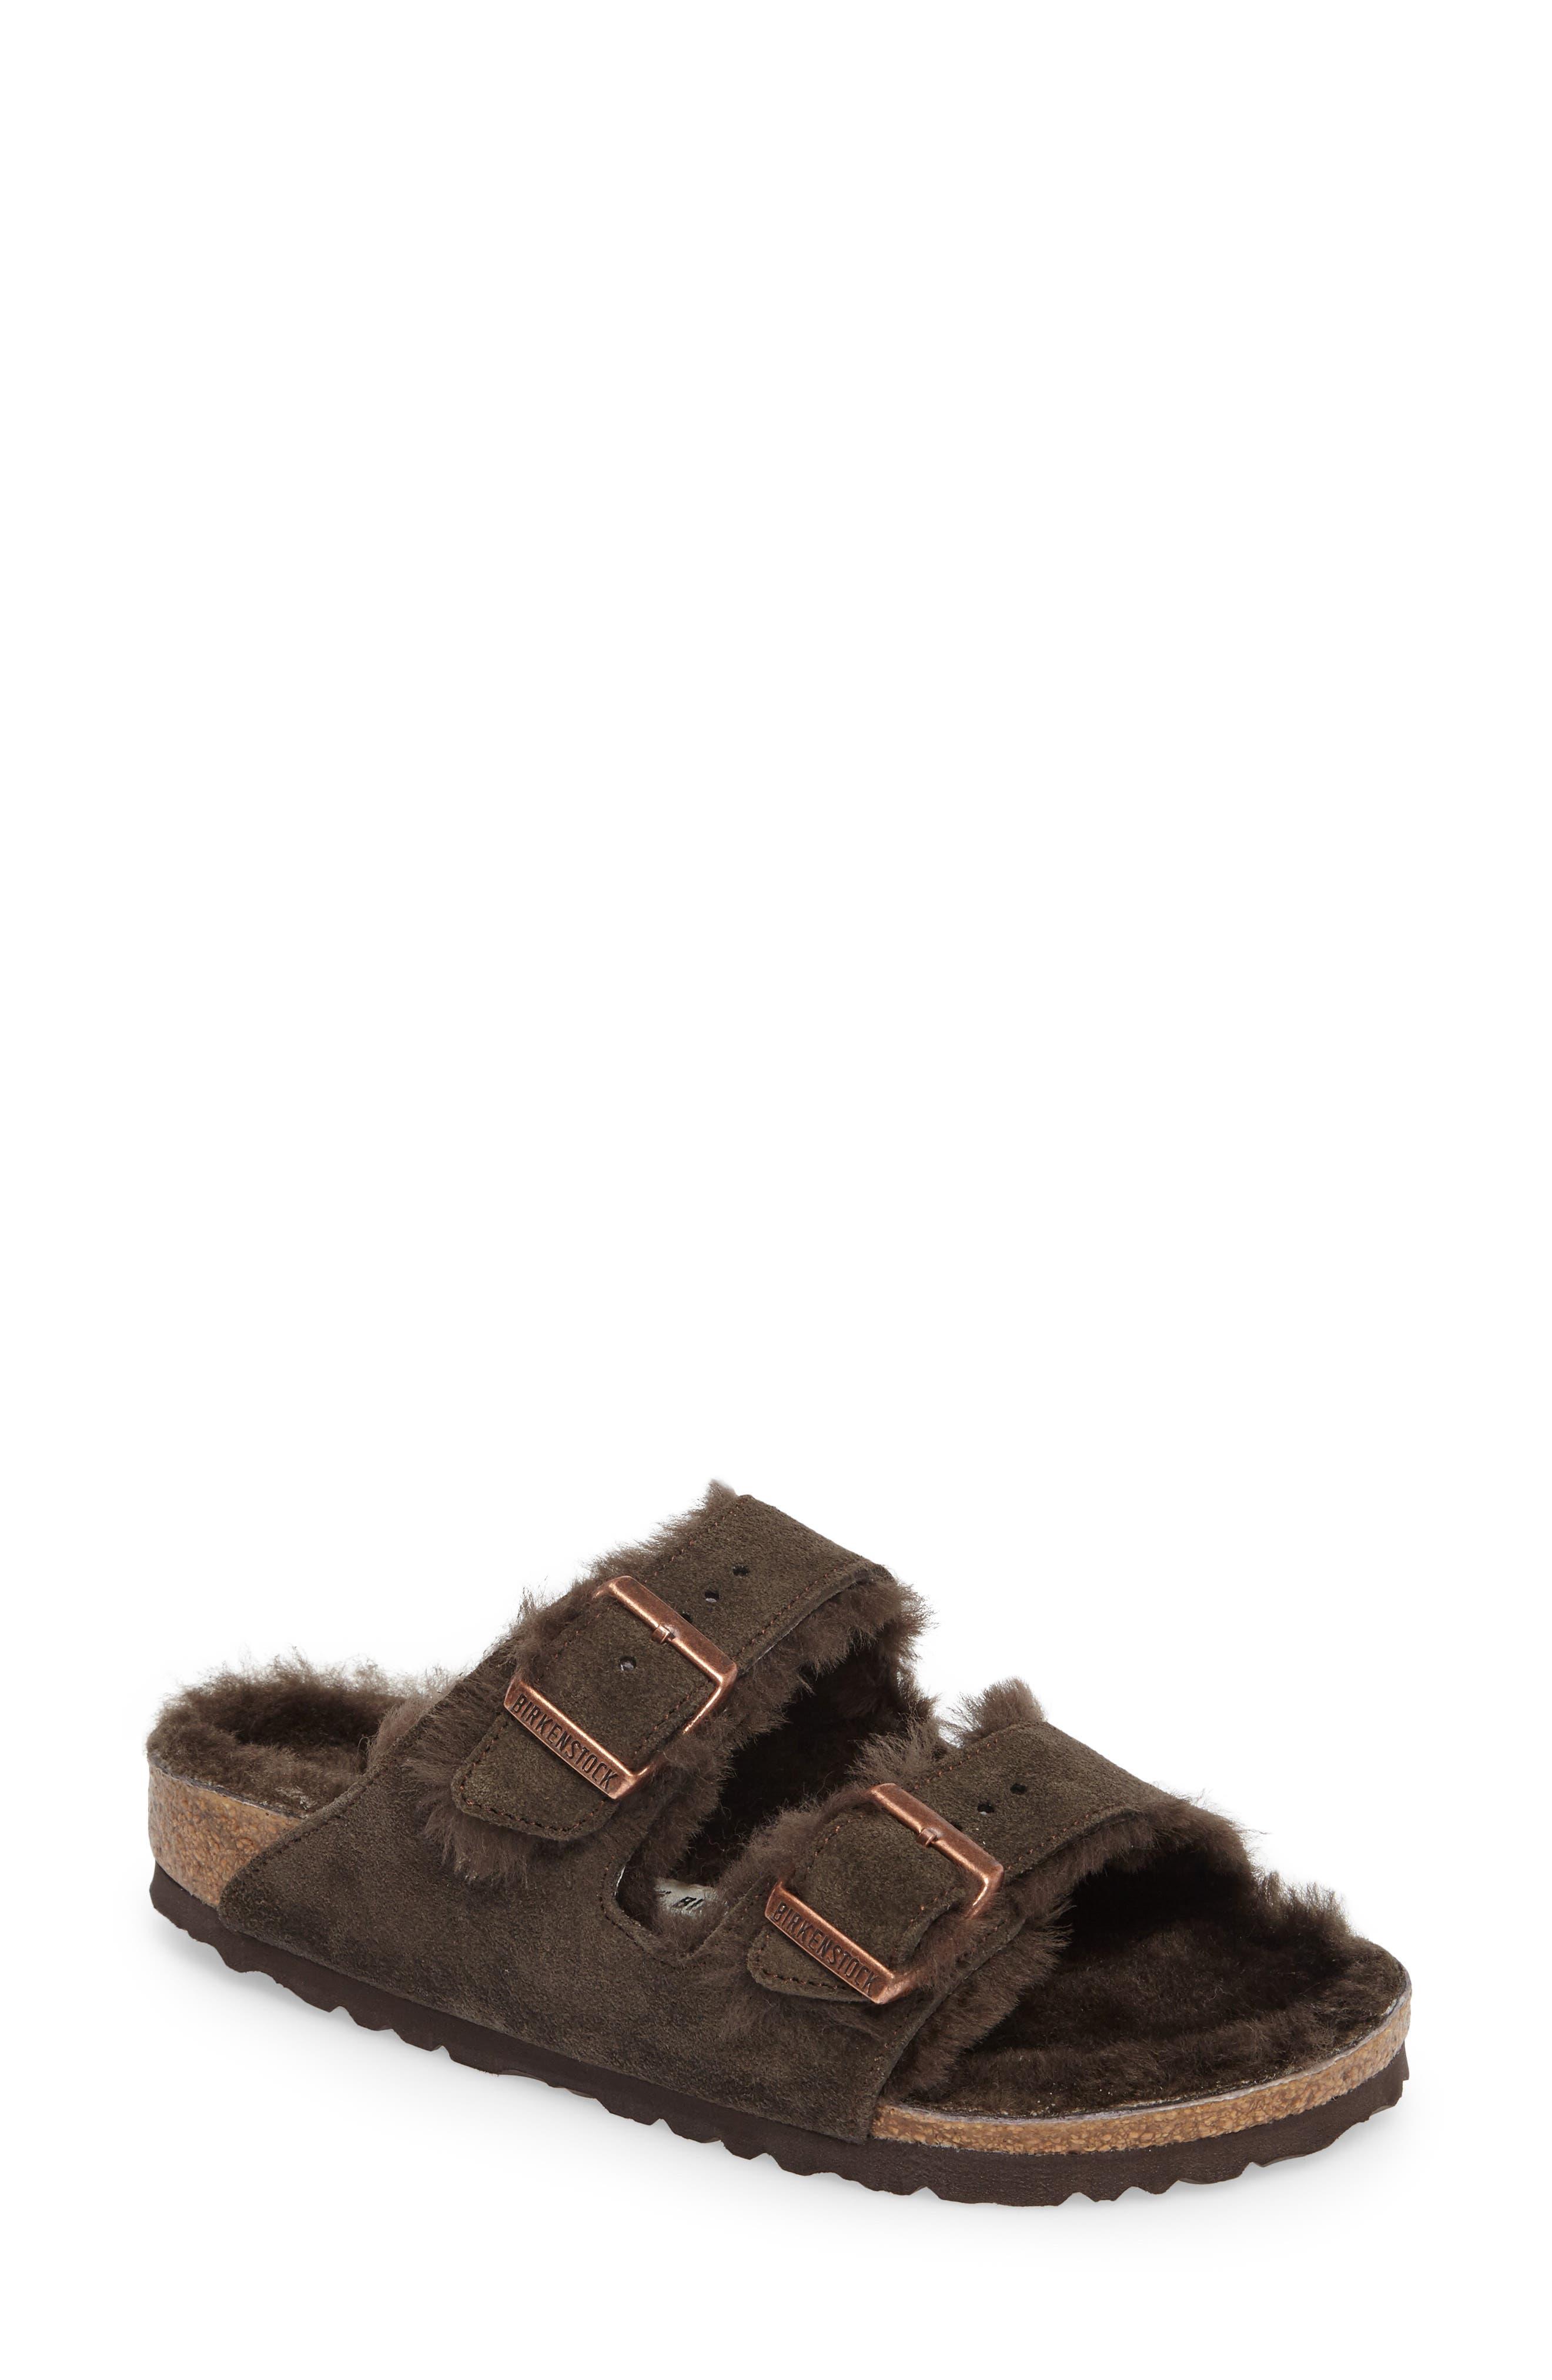 Arizona Genuine Shearling Lined Sandal,                         Main,                         color, 200